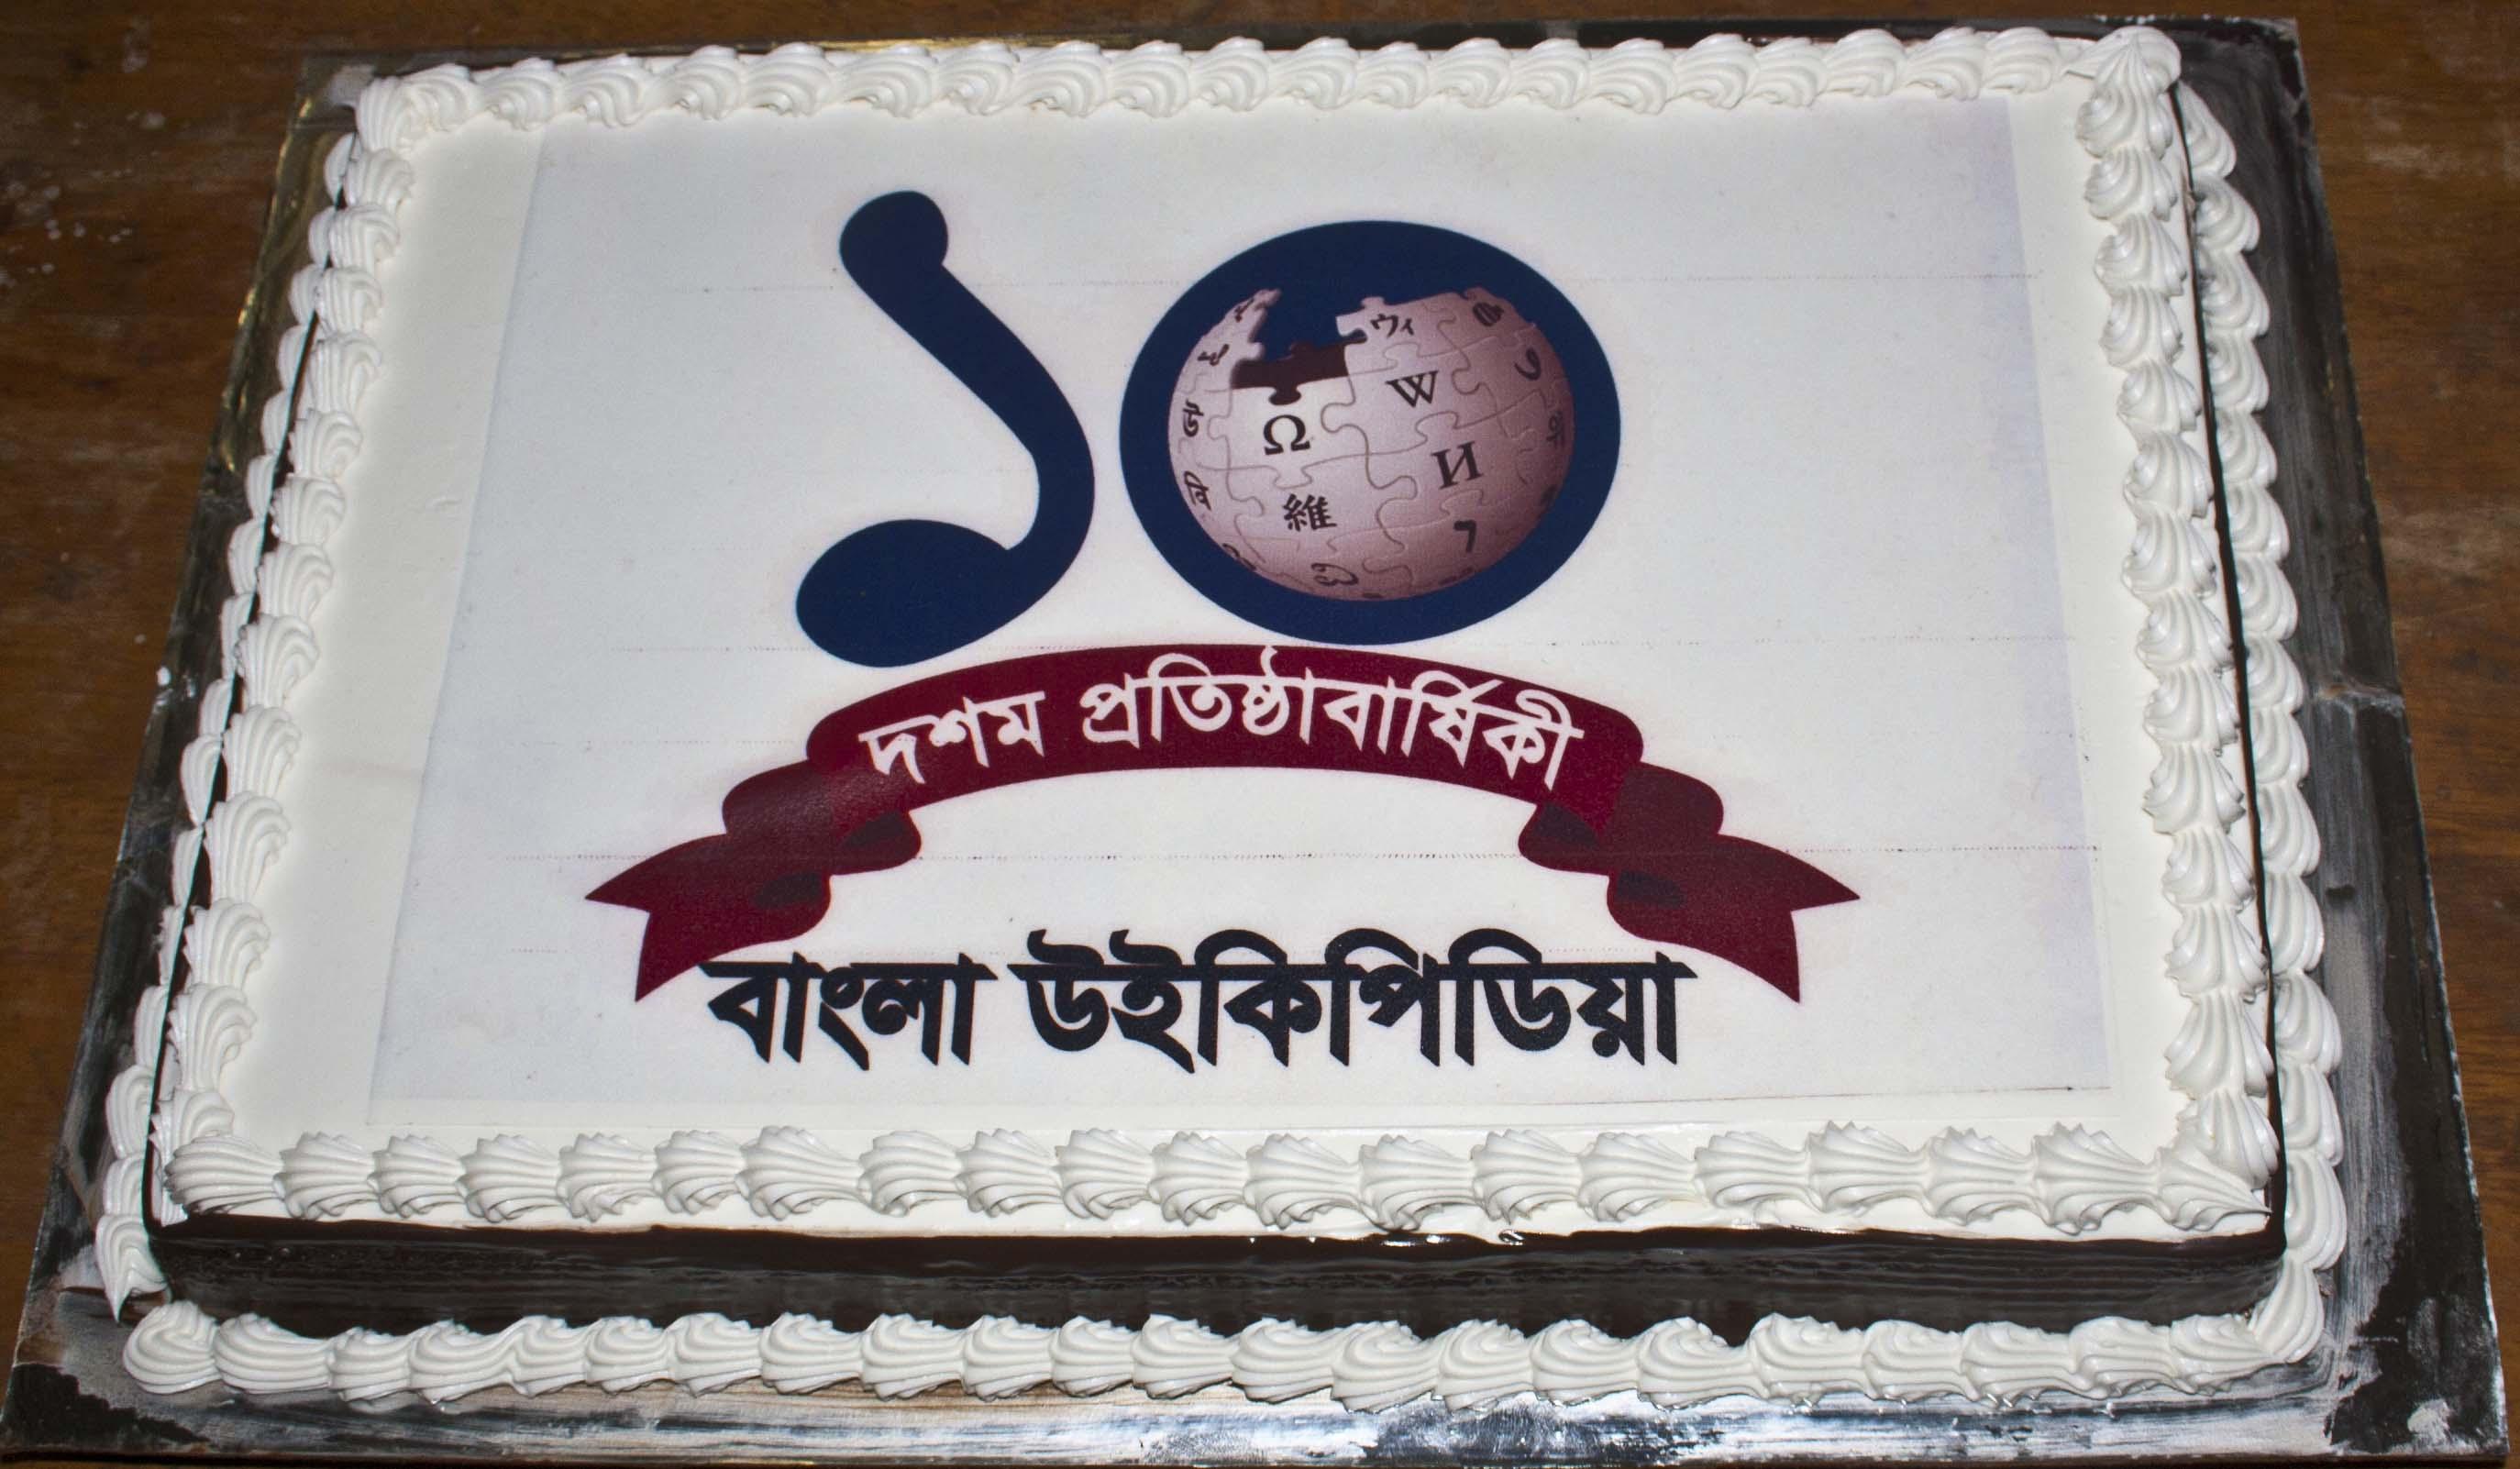 File Bnwiki10 Bengali Wikipedia Birthday Cake Wikipedia 10th